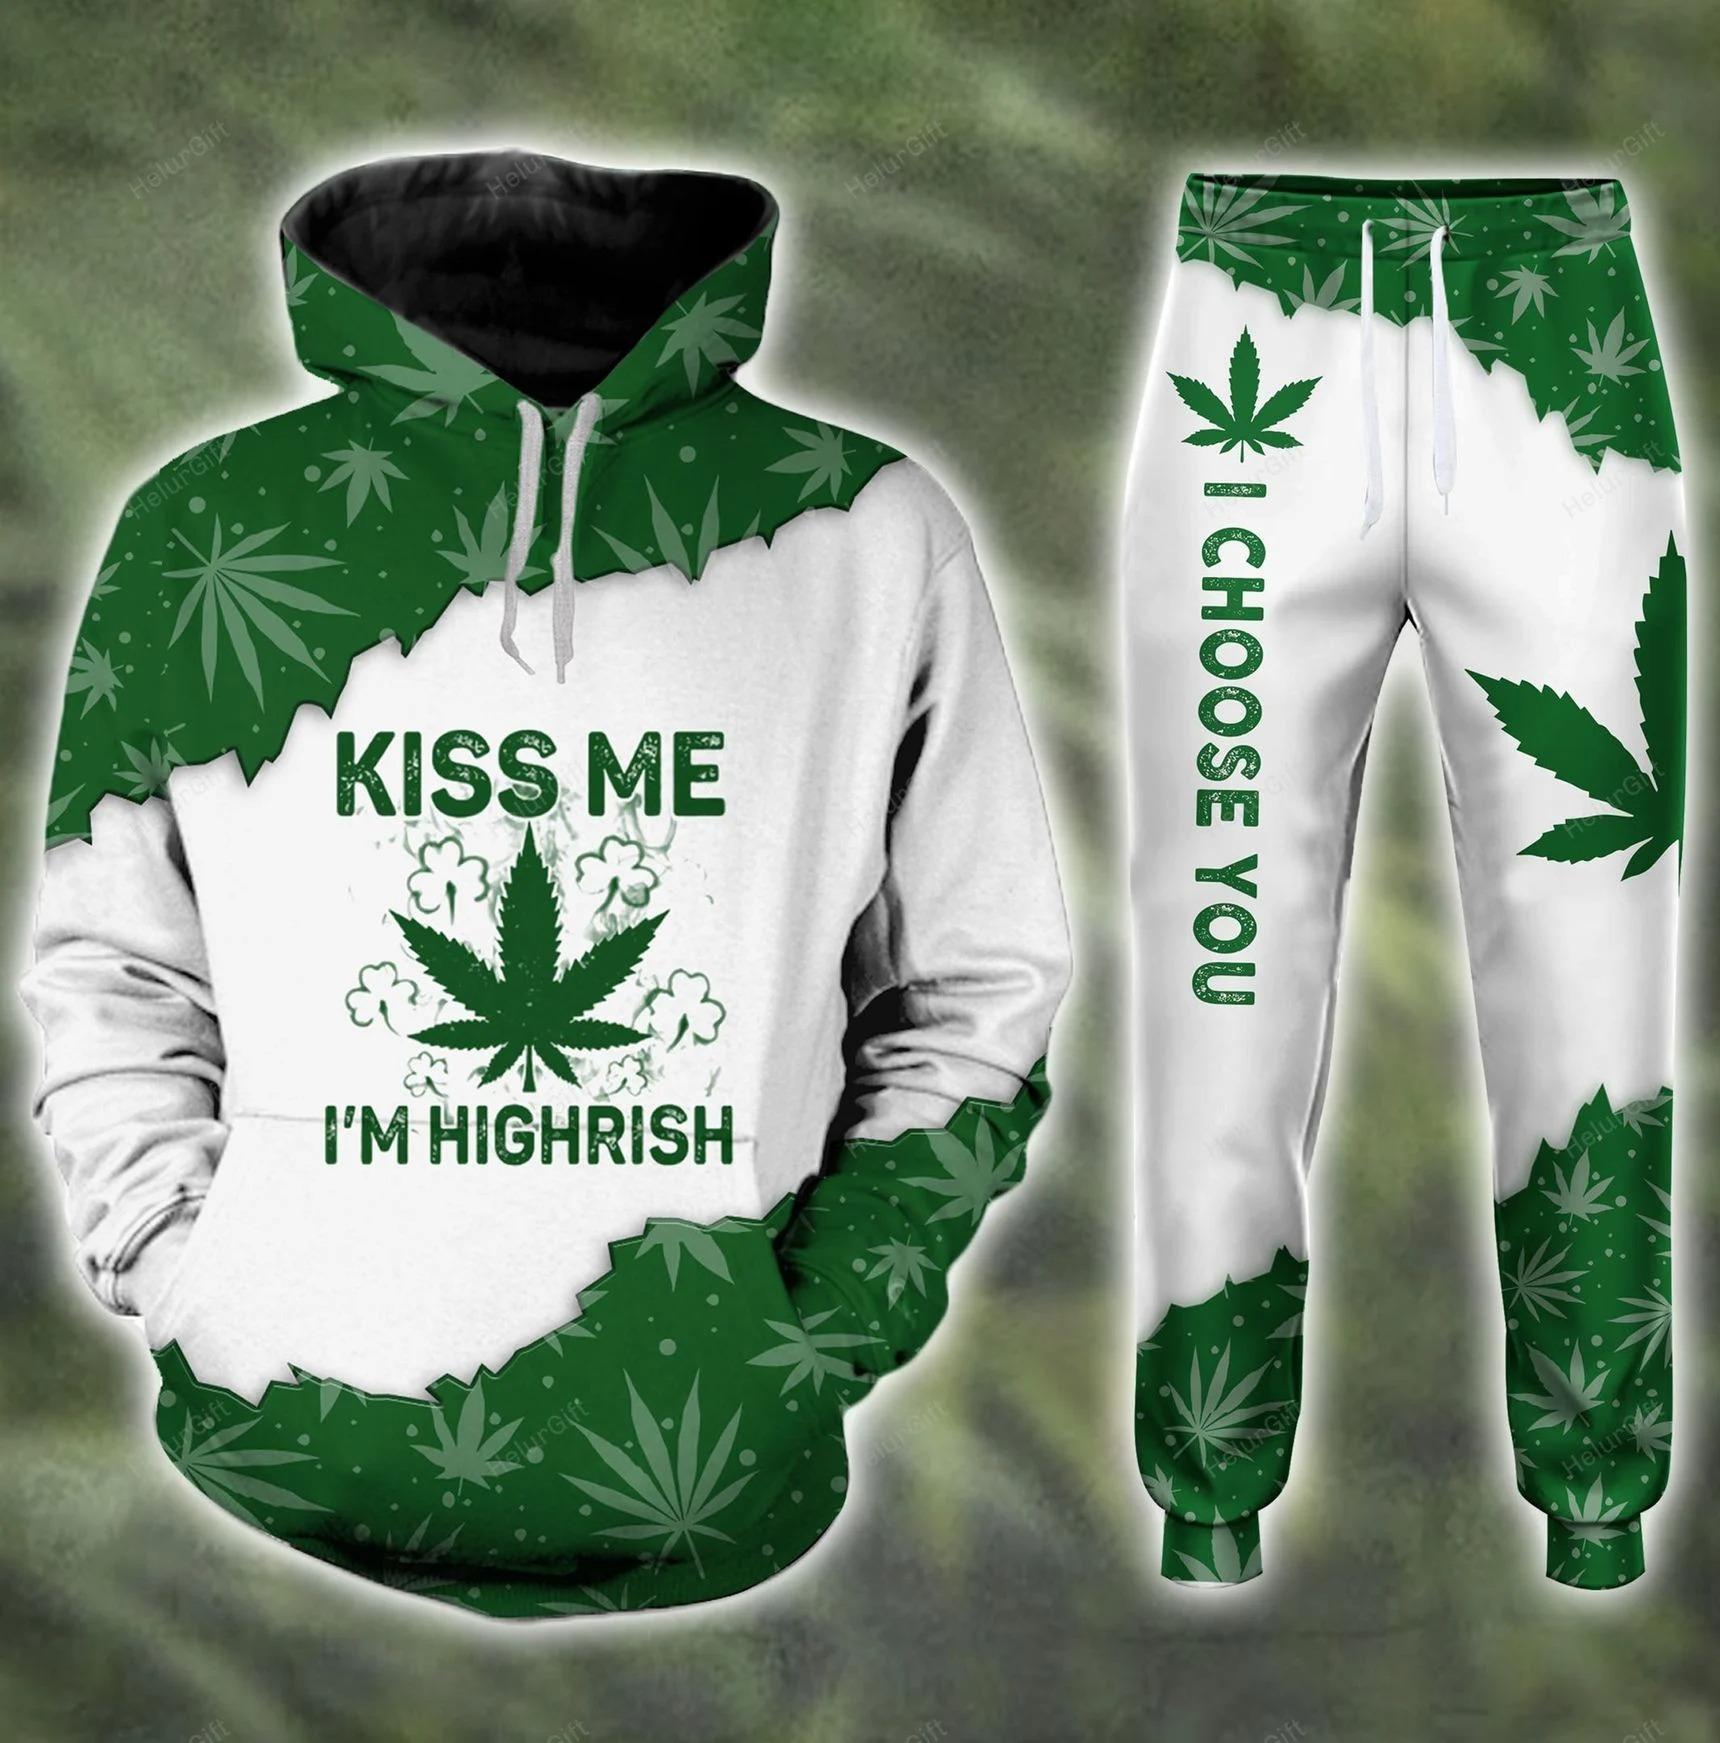 Kiss Me I'm Highrish Weed 3D Hoodie and sweatpants